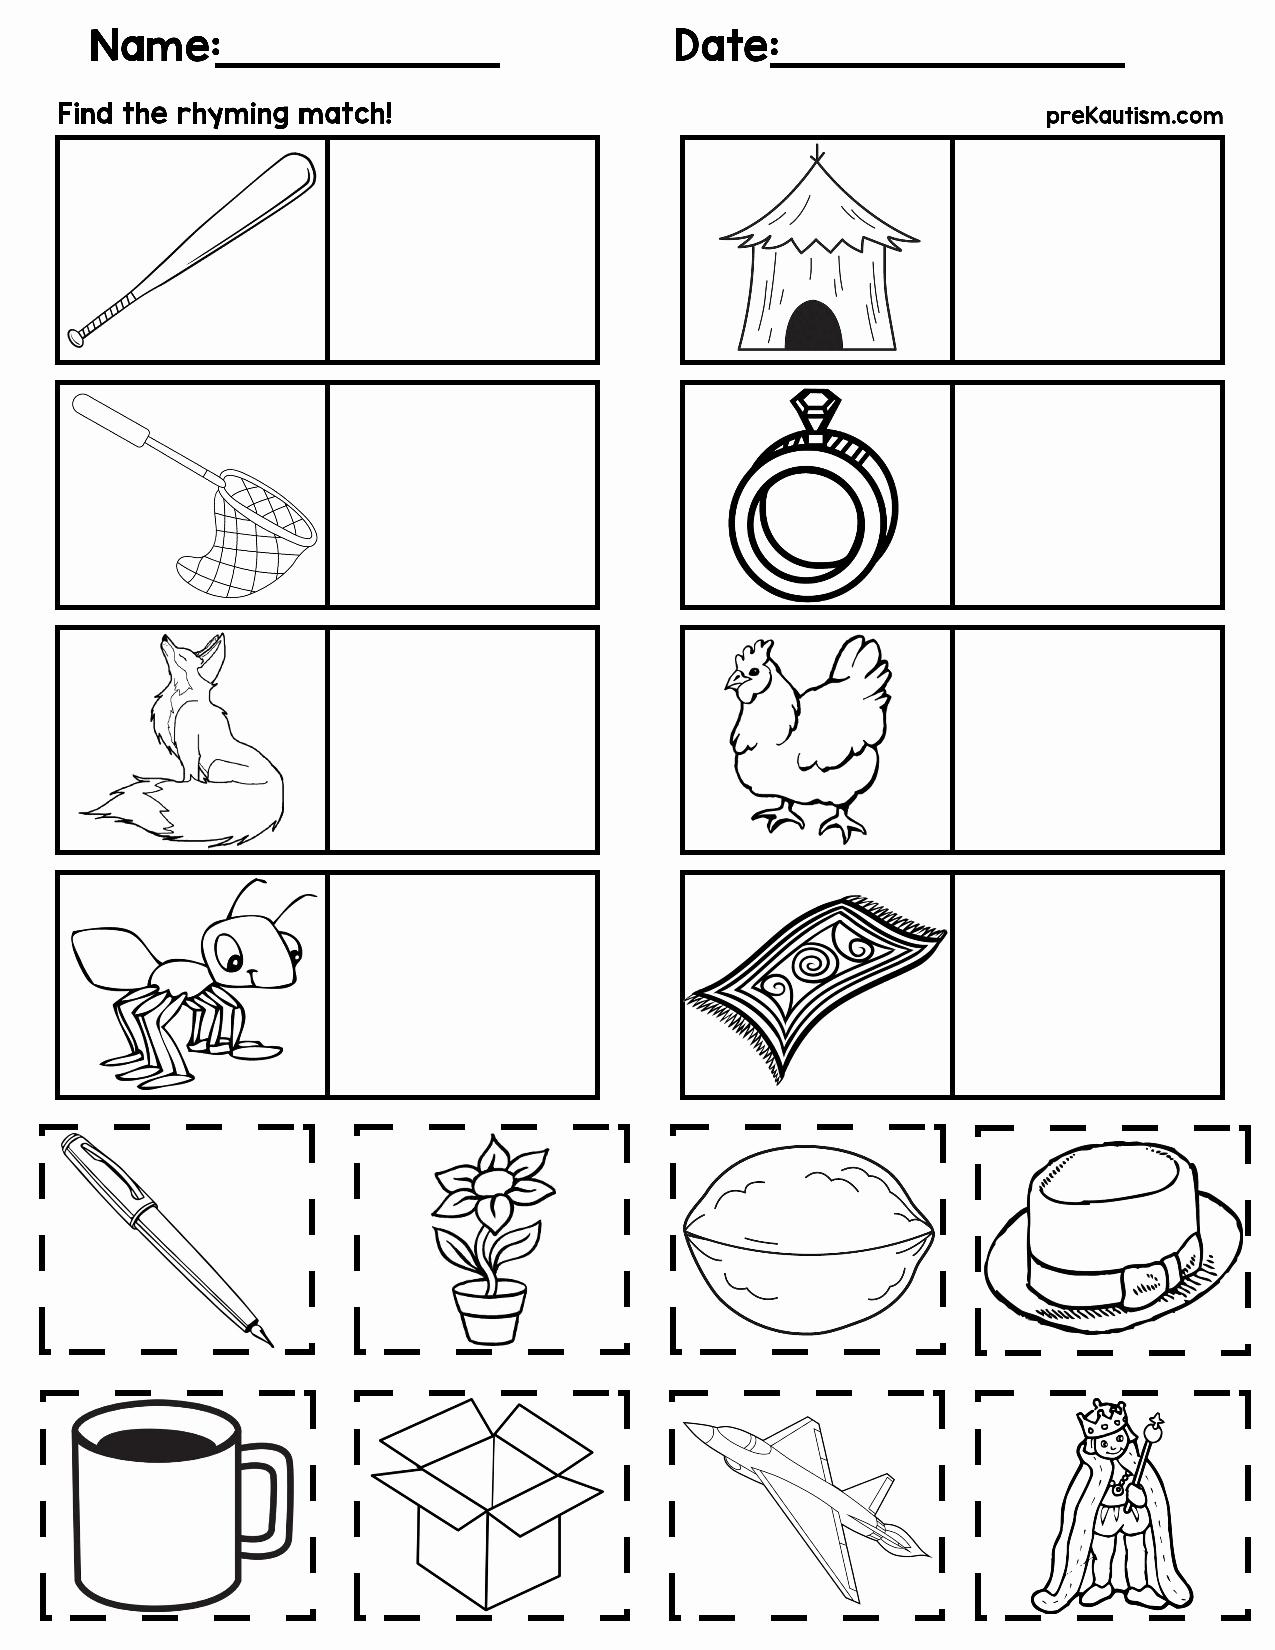 Rhyming Worksheets for Preschool Inspirational Matching Rhyming Words